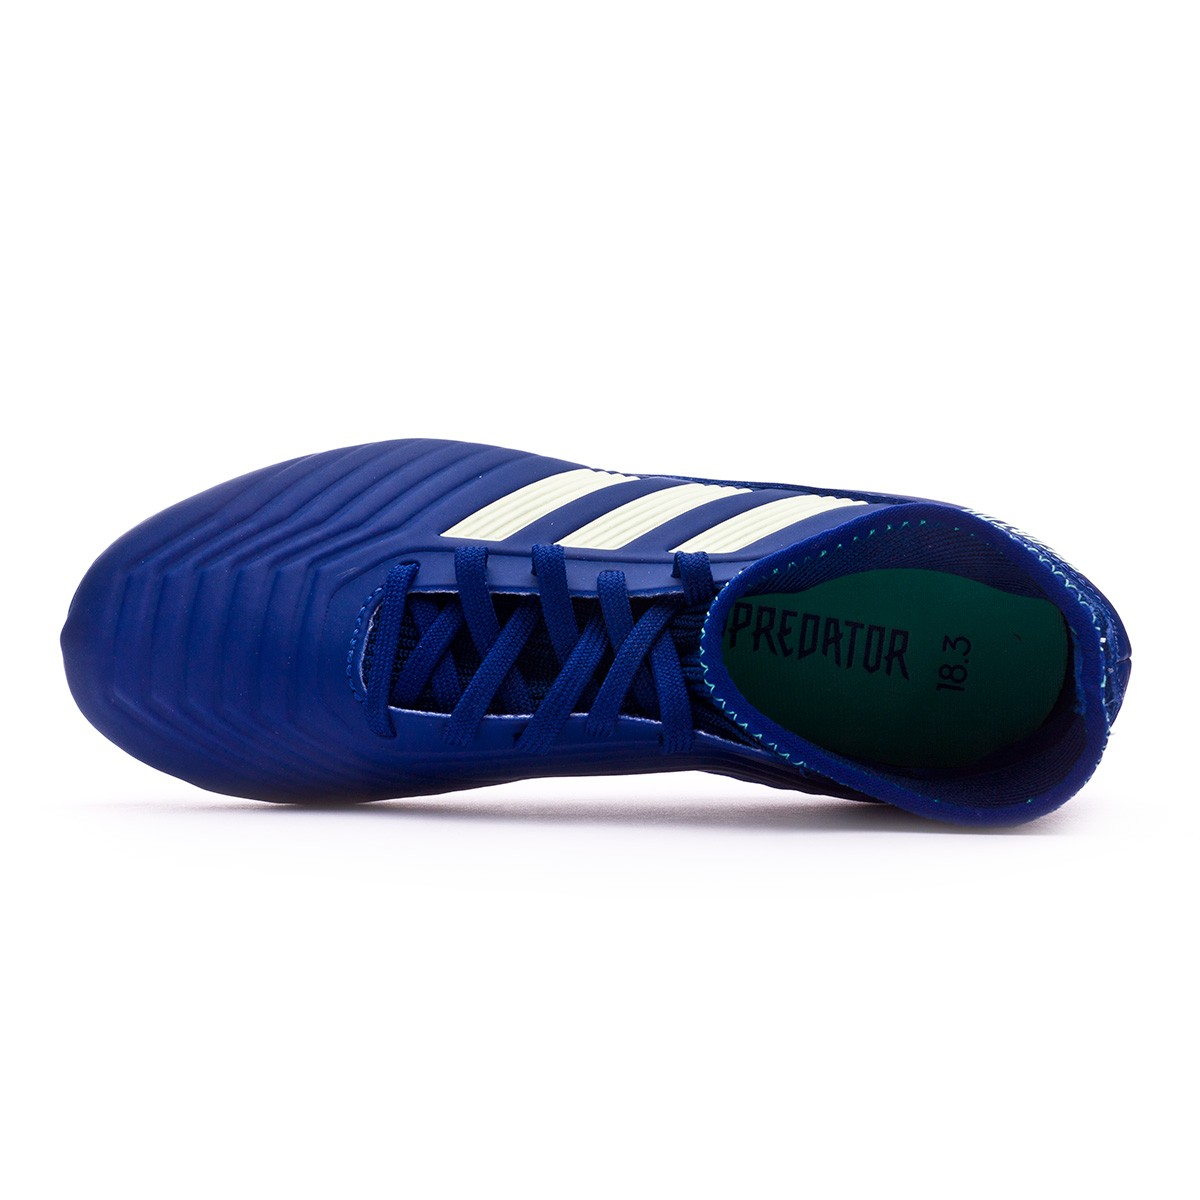 2f2cff94e Football Boots adidas Kids Predator 18.3 FG Unity ink-Aero green-Hi-res  green - Football store Fútbol Emotion